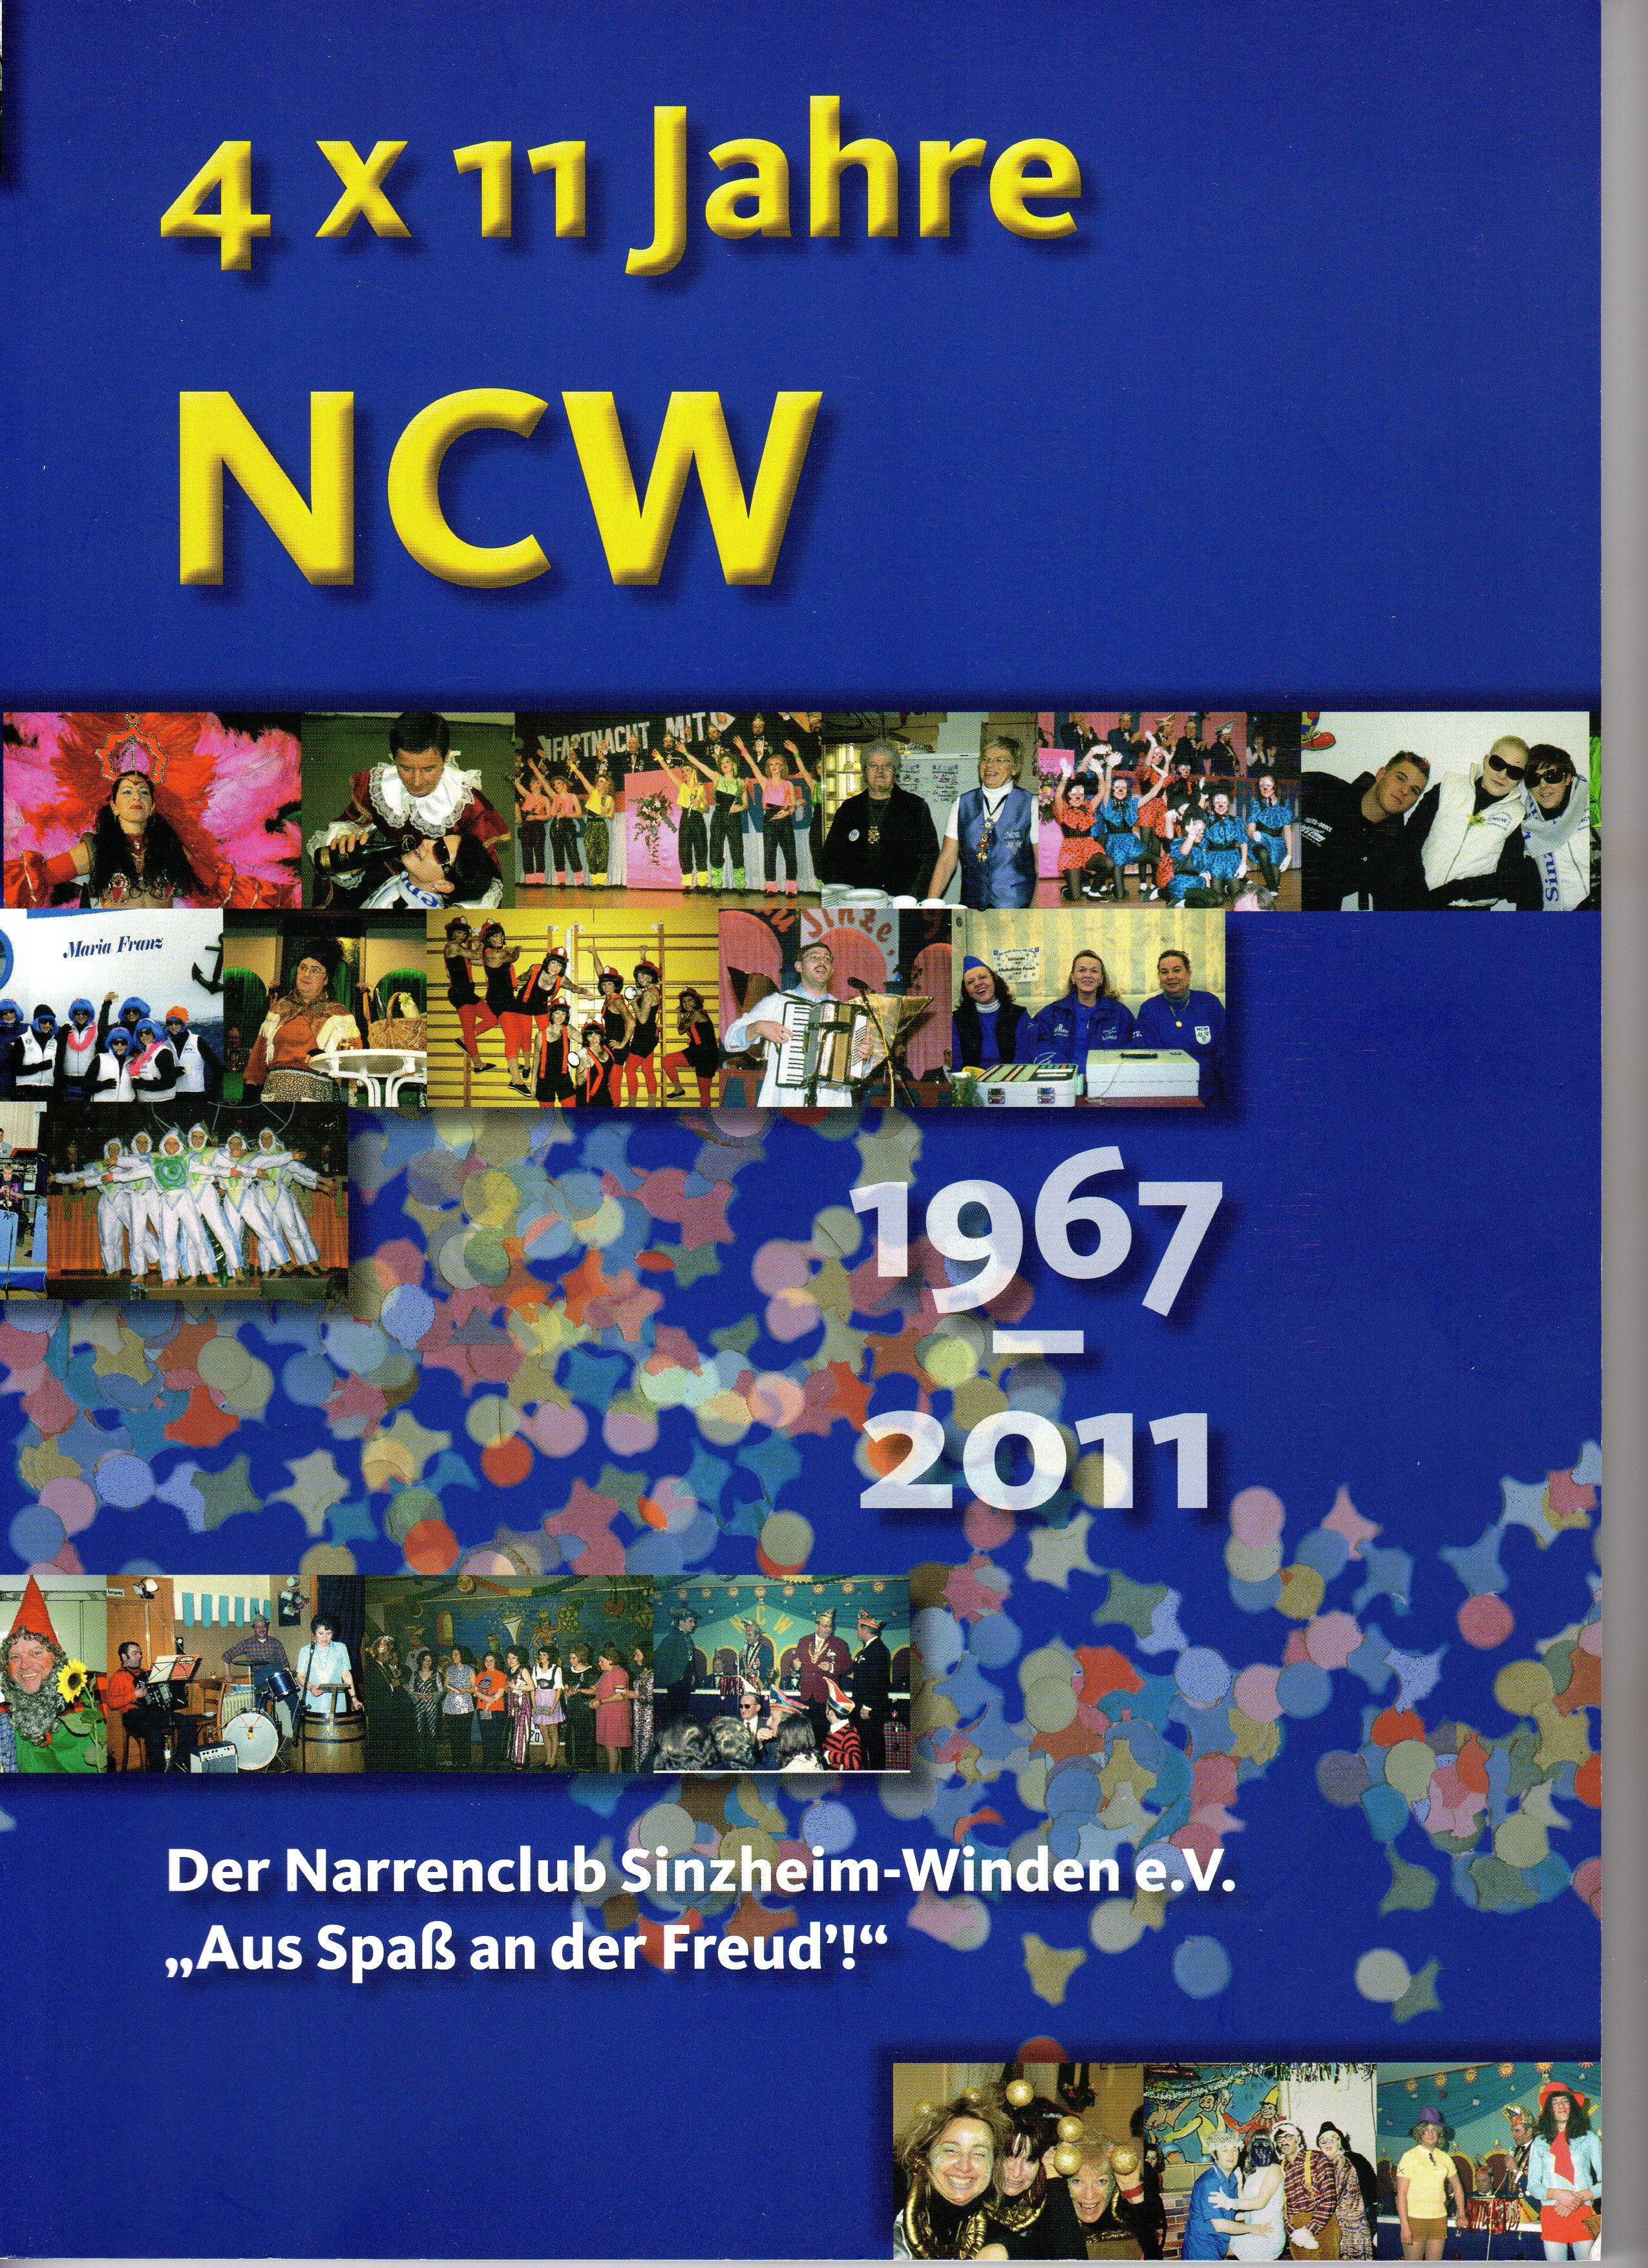 NCW_20160108_0052